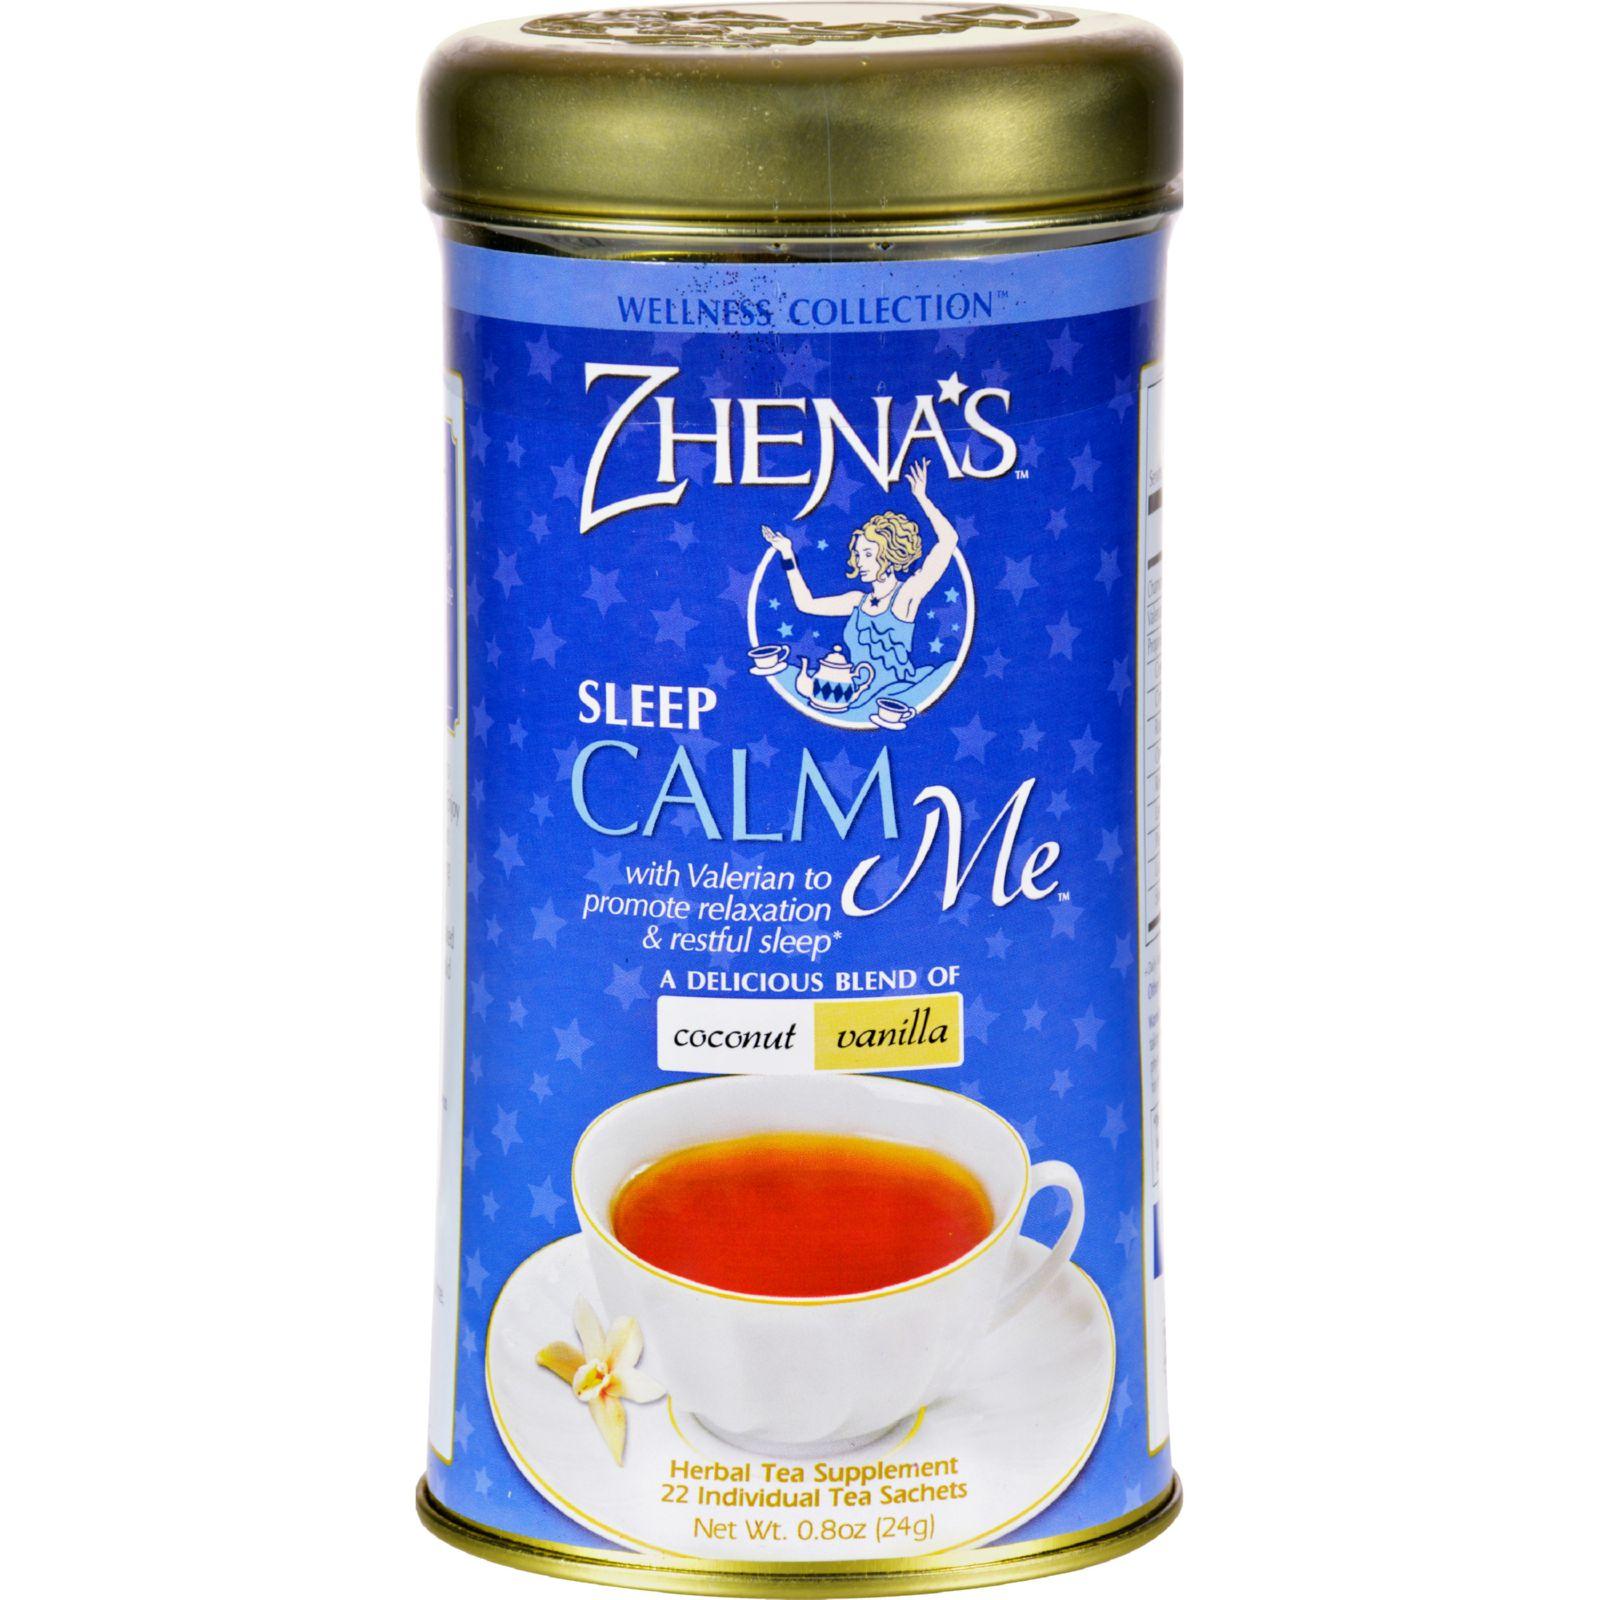 Zhena's Gypsy Tea Calm Me Coconut Van - Case Of 6 - 22 Bags